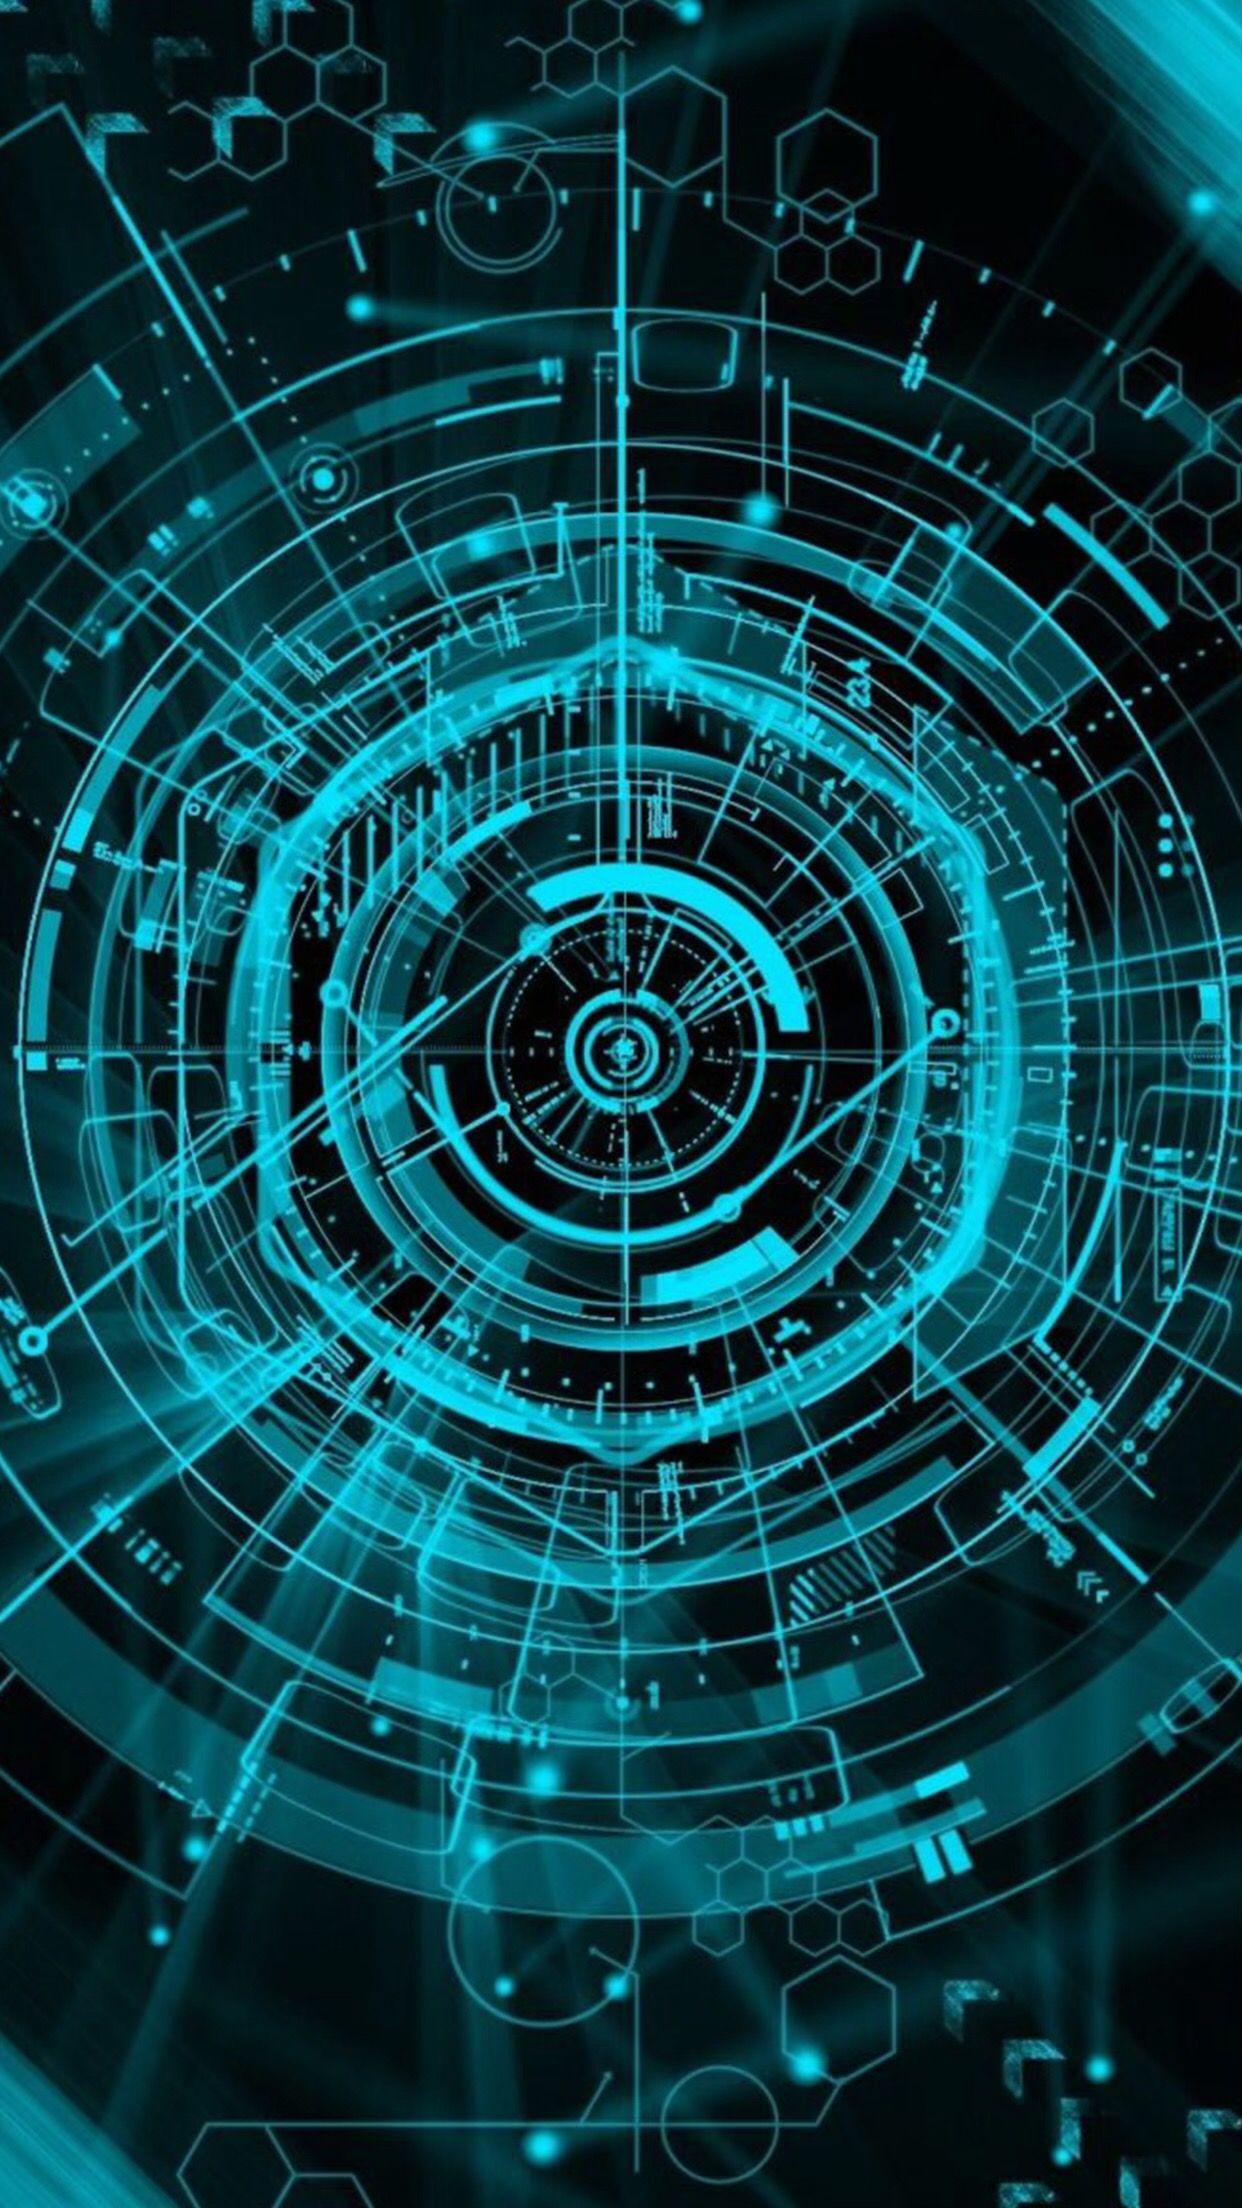 Digital Dreams Technology Wallpaper Cellphone Wallpaper Tron Legacy